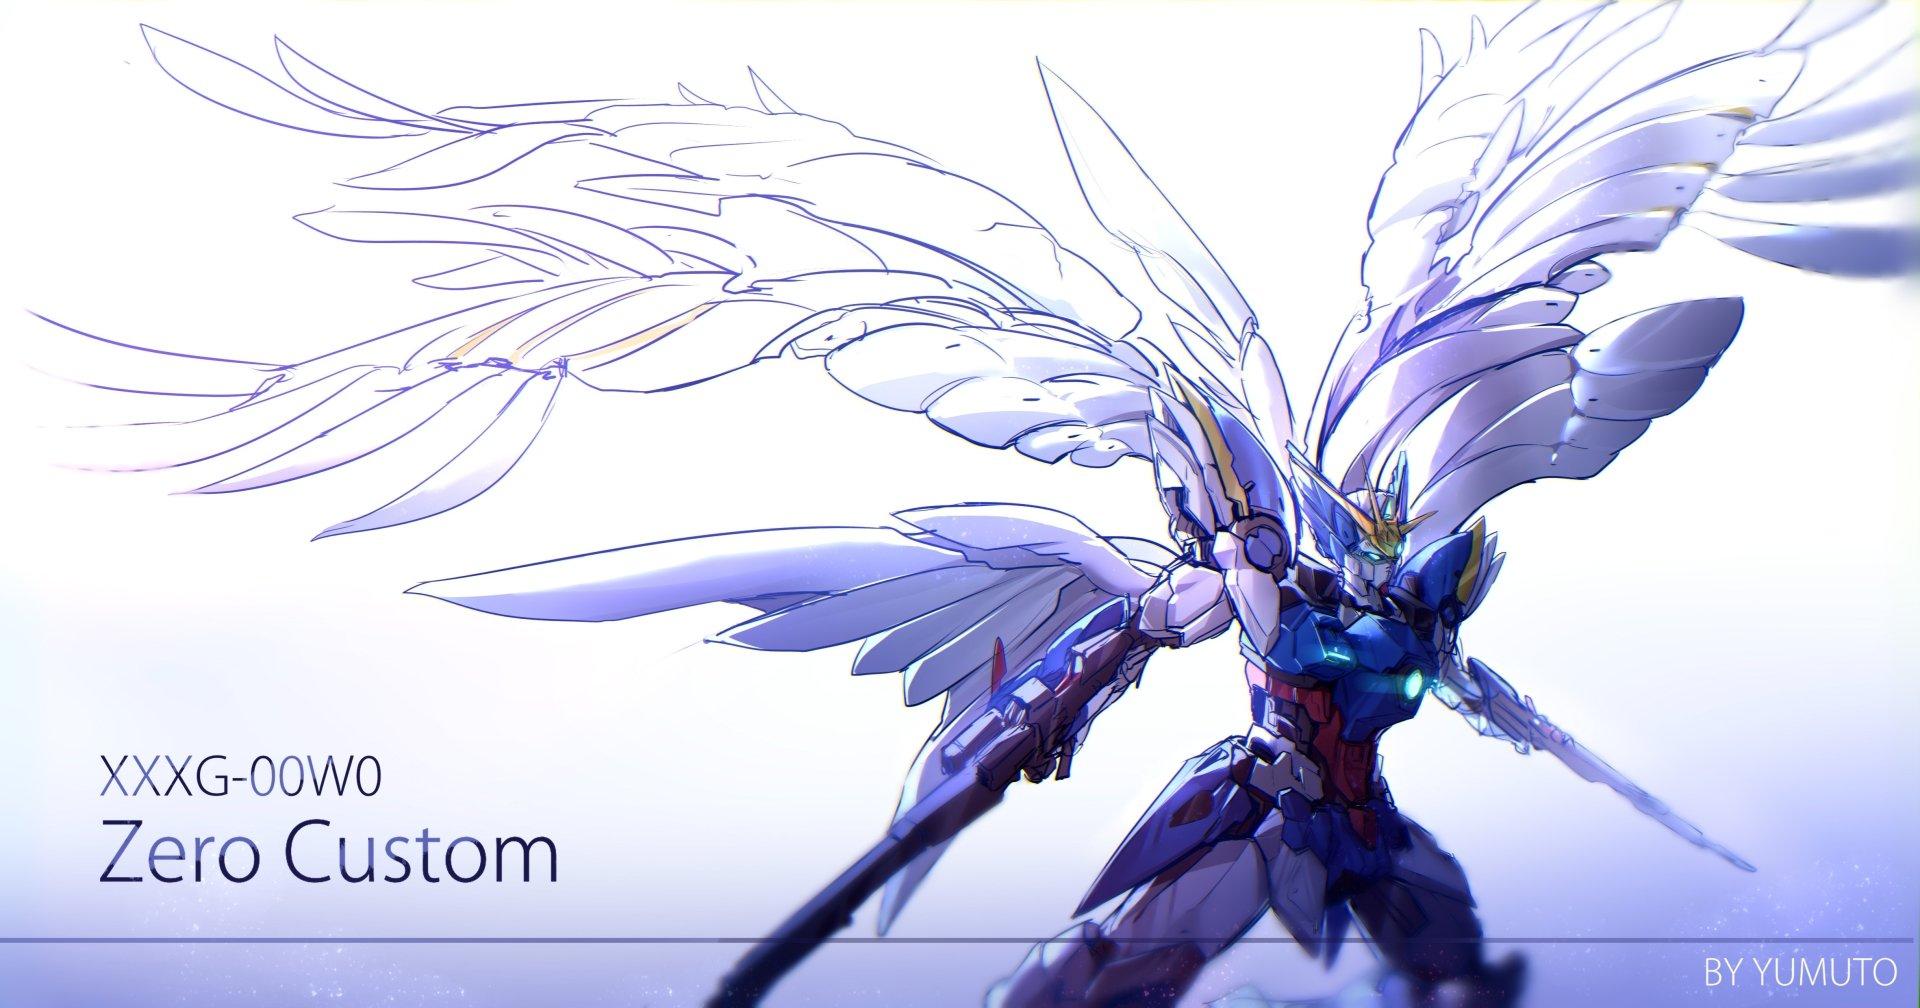 Gundam Wing Wallpapers Top Free Gundam Wing Backgrounds Wallpaperaccess